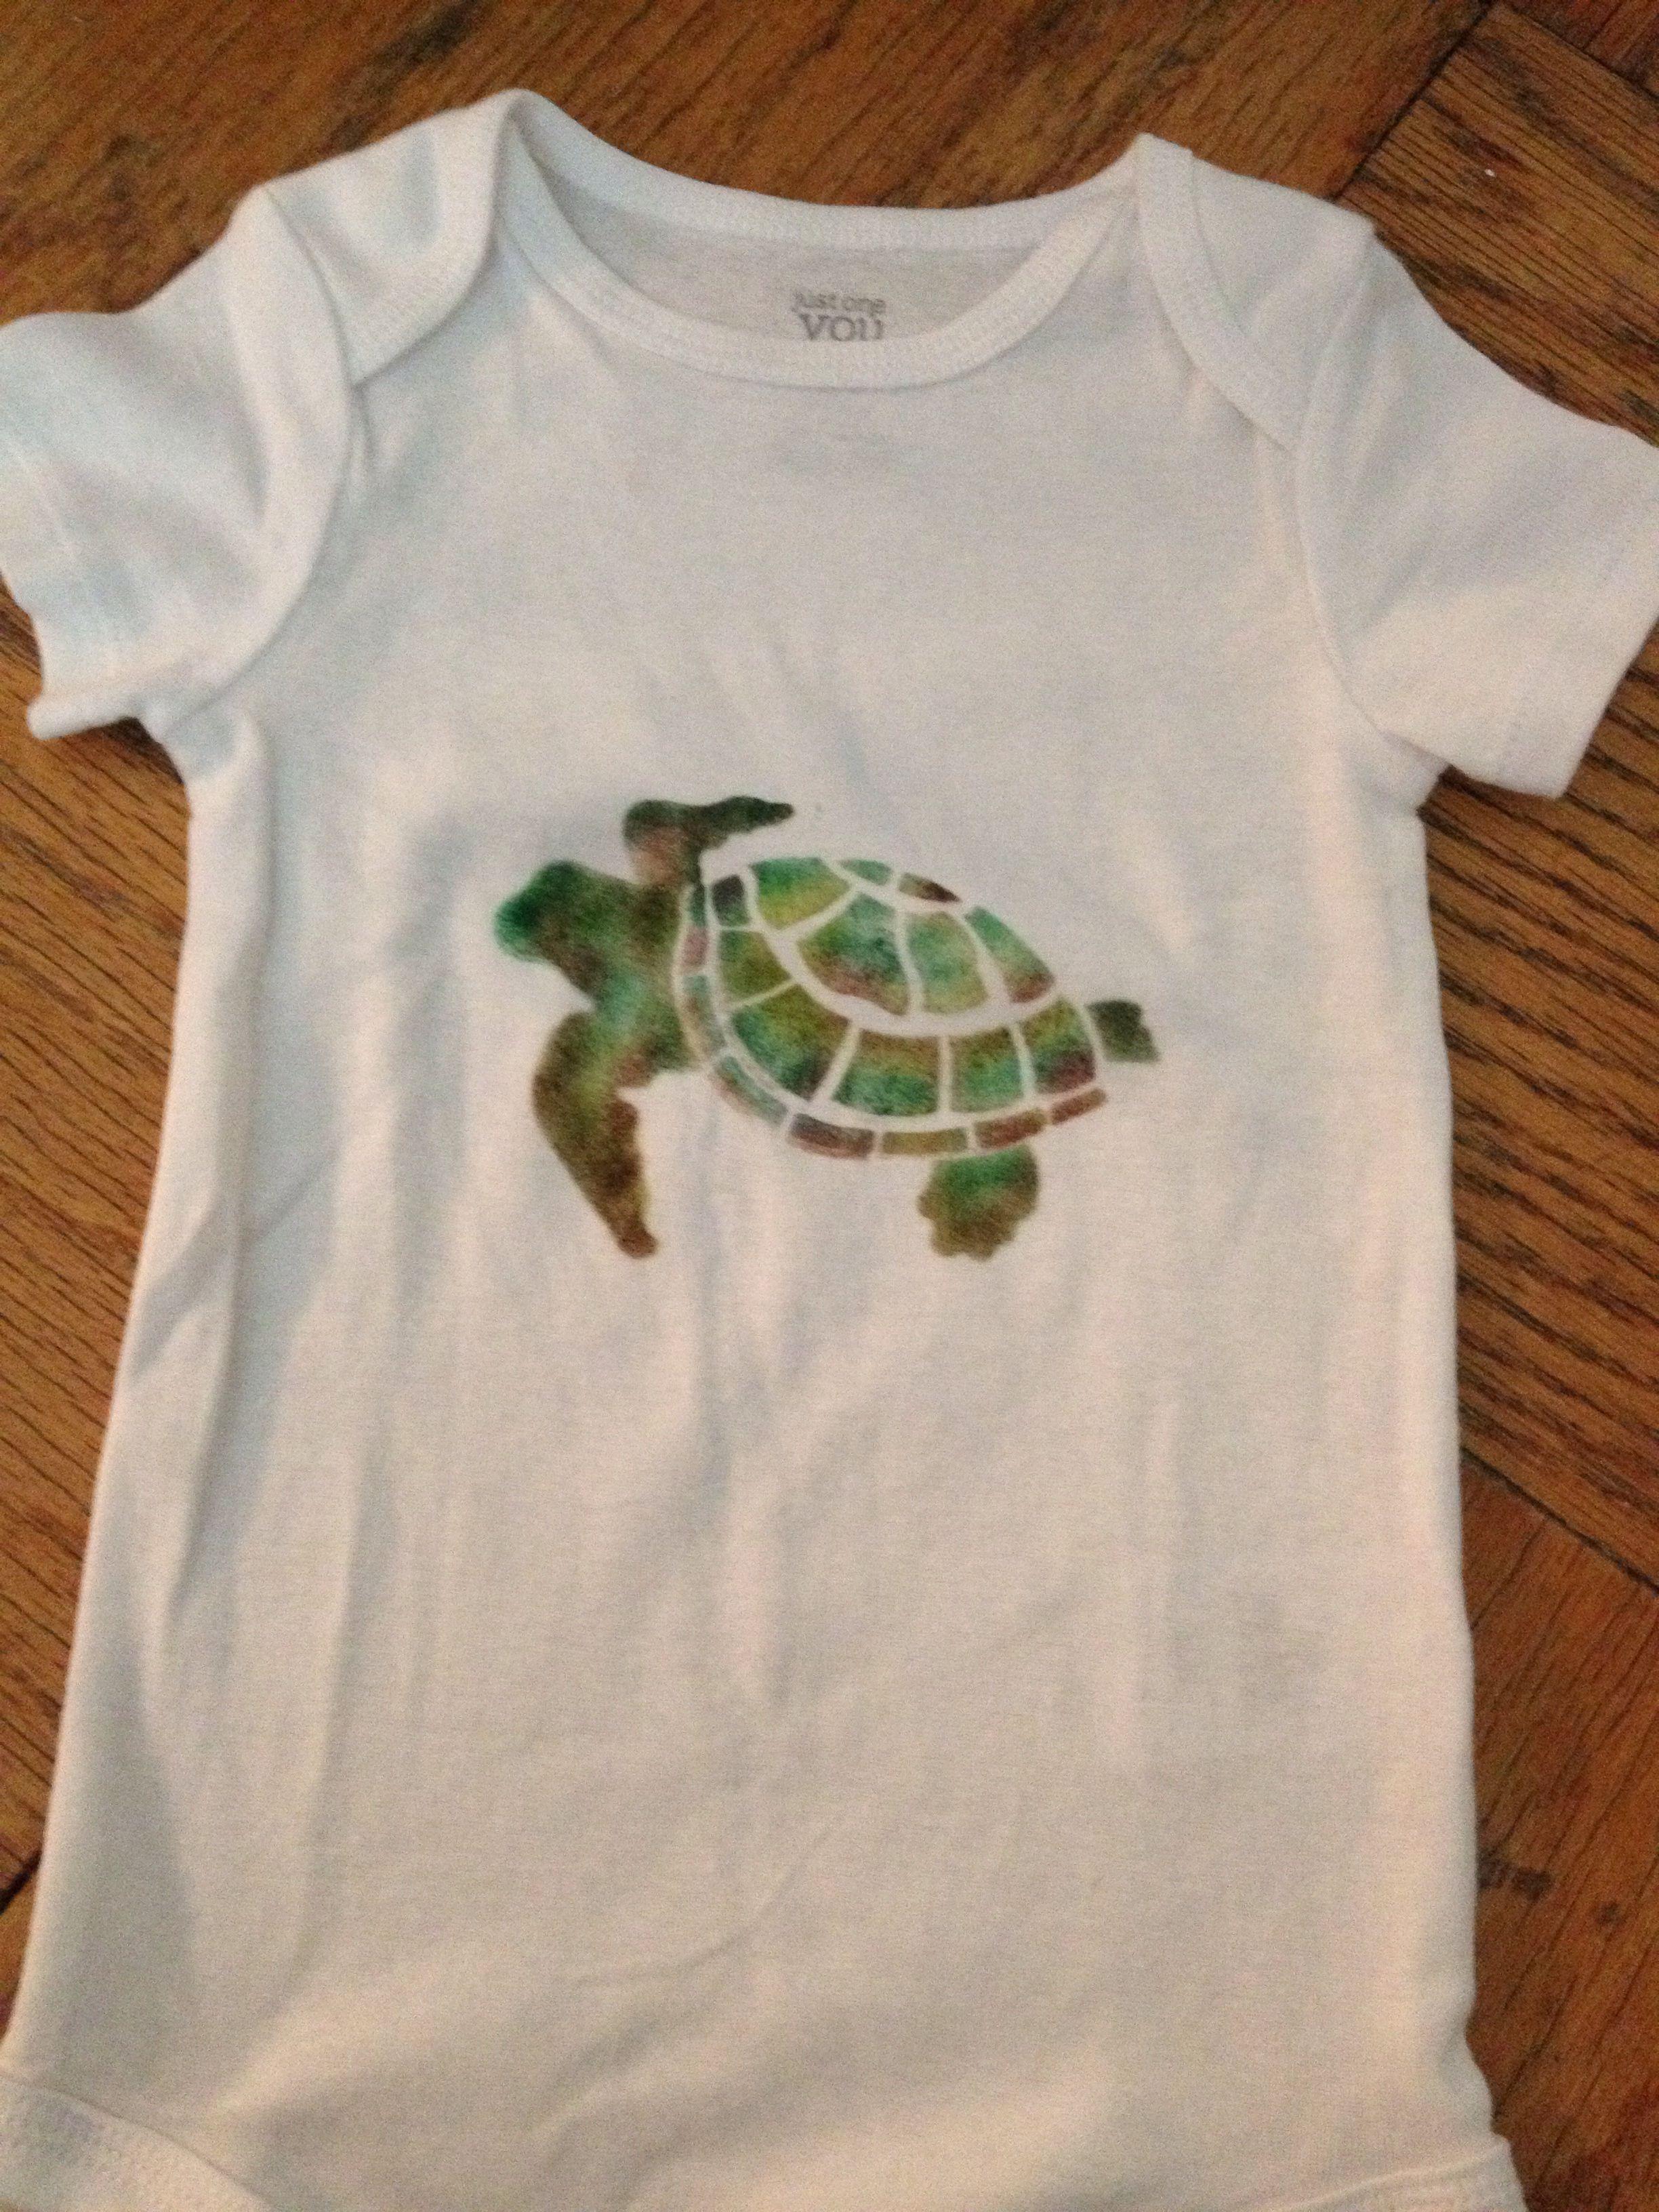 Stenciled sea turtle on onesie